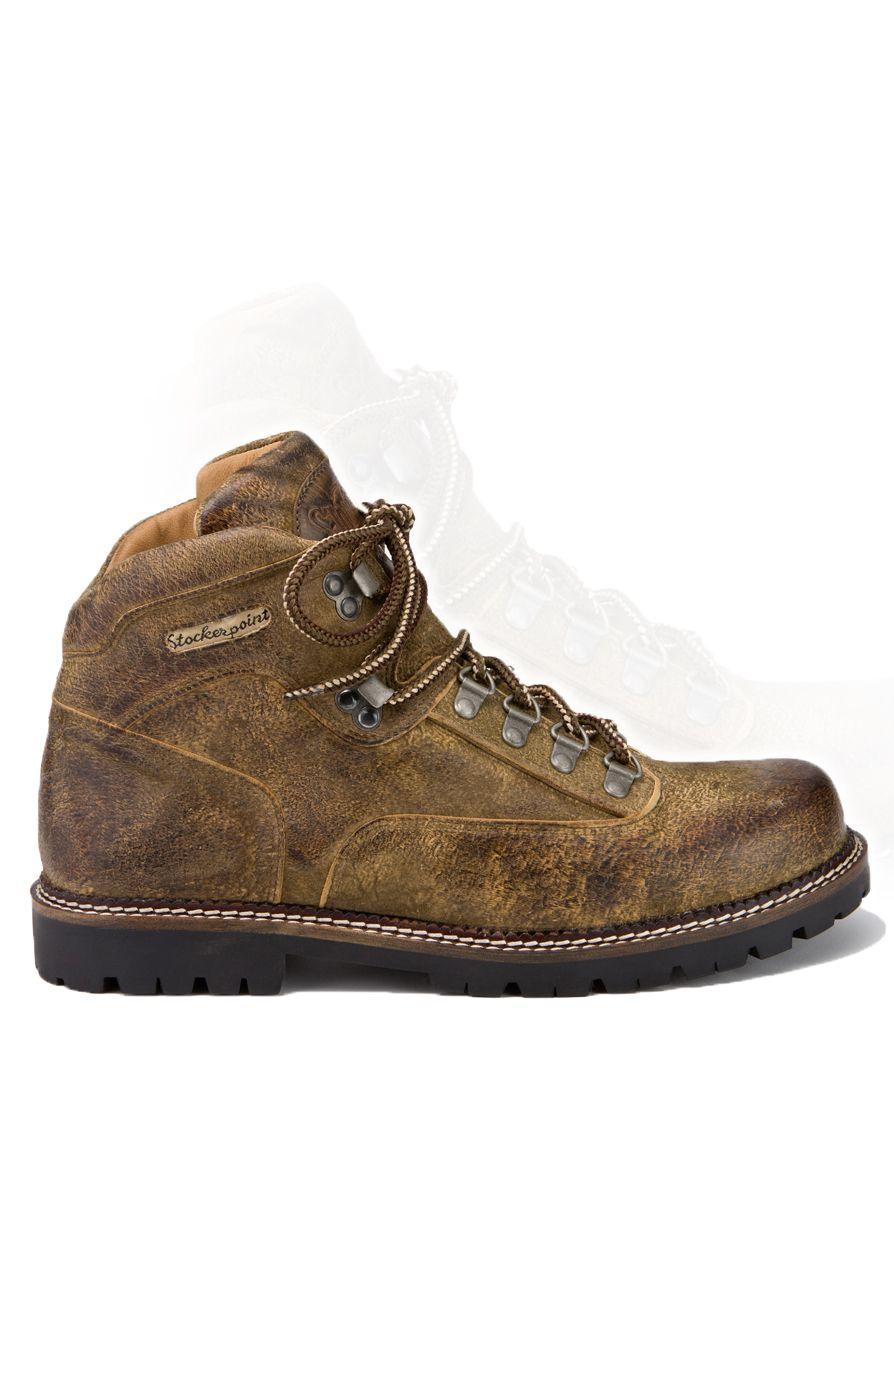 Trachten Schuhe als Herren High Sneaker in tabak braun | Wirkes